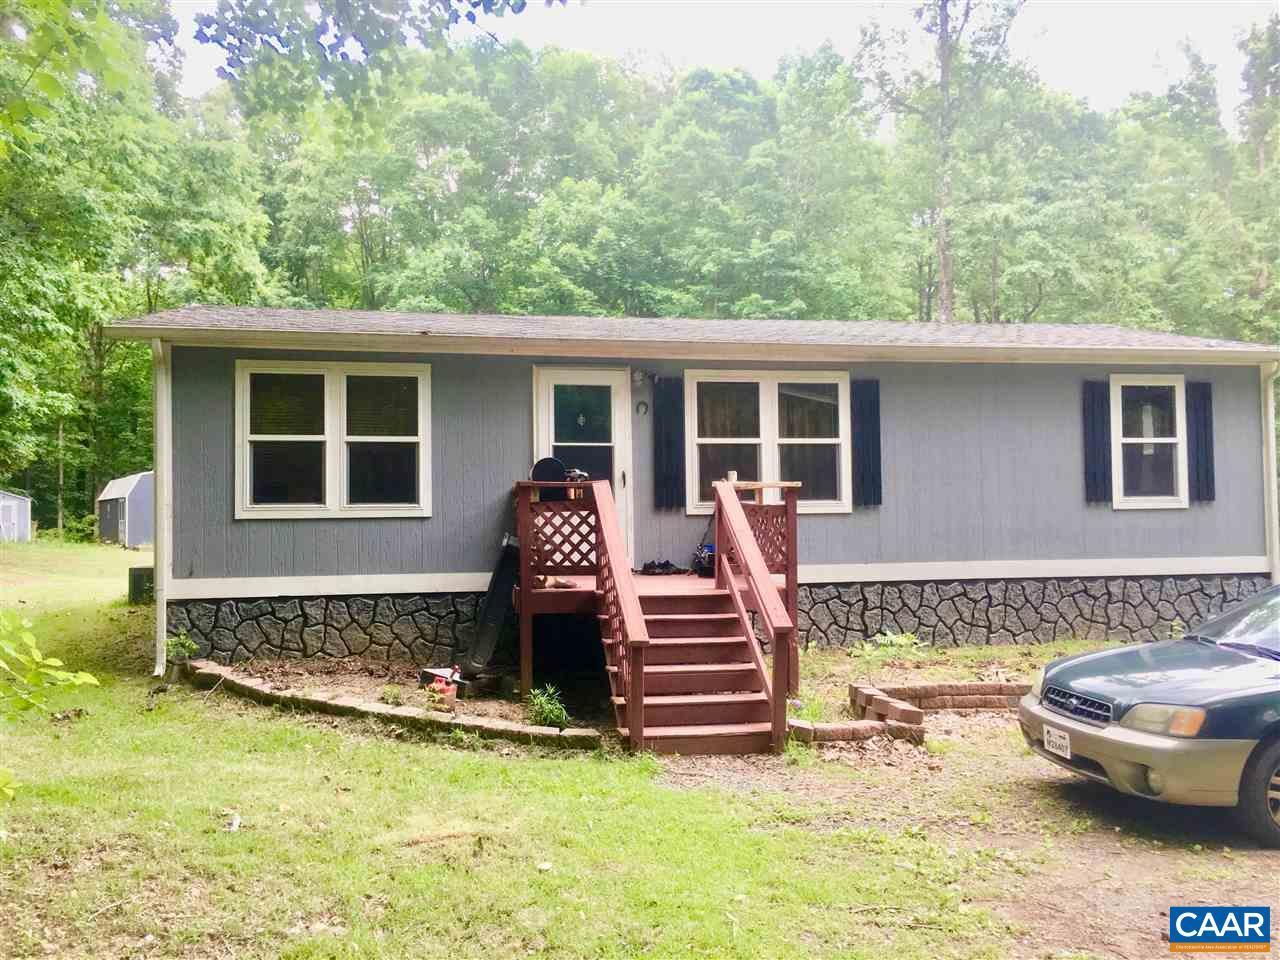 home for sale , MLS #577712, 24131 Monrovia Rd